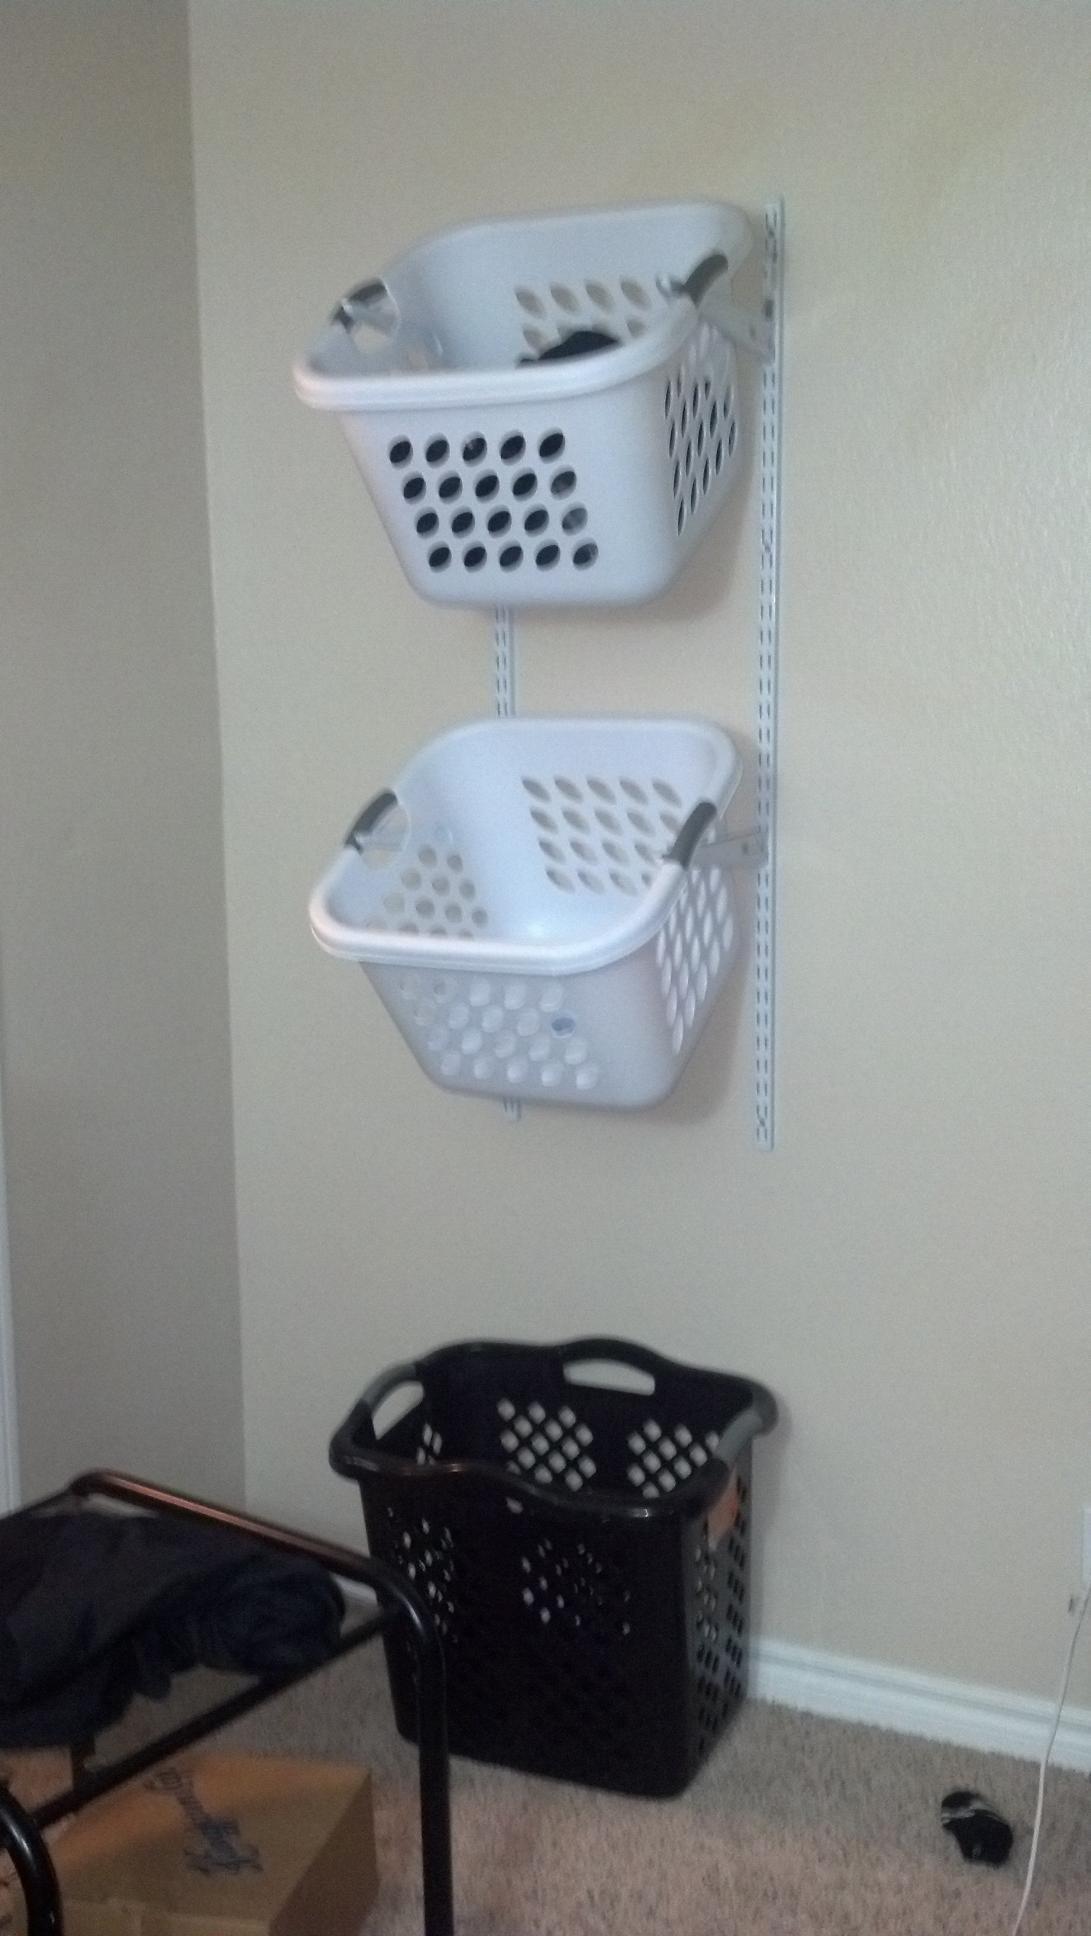 Hanging Laundry Baskets Using Shelf Brackets My Very First